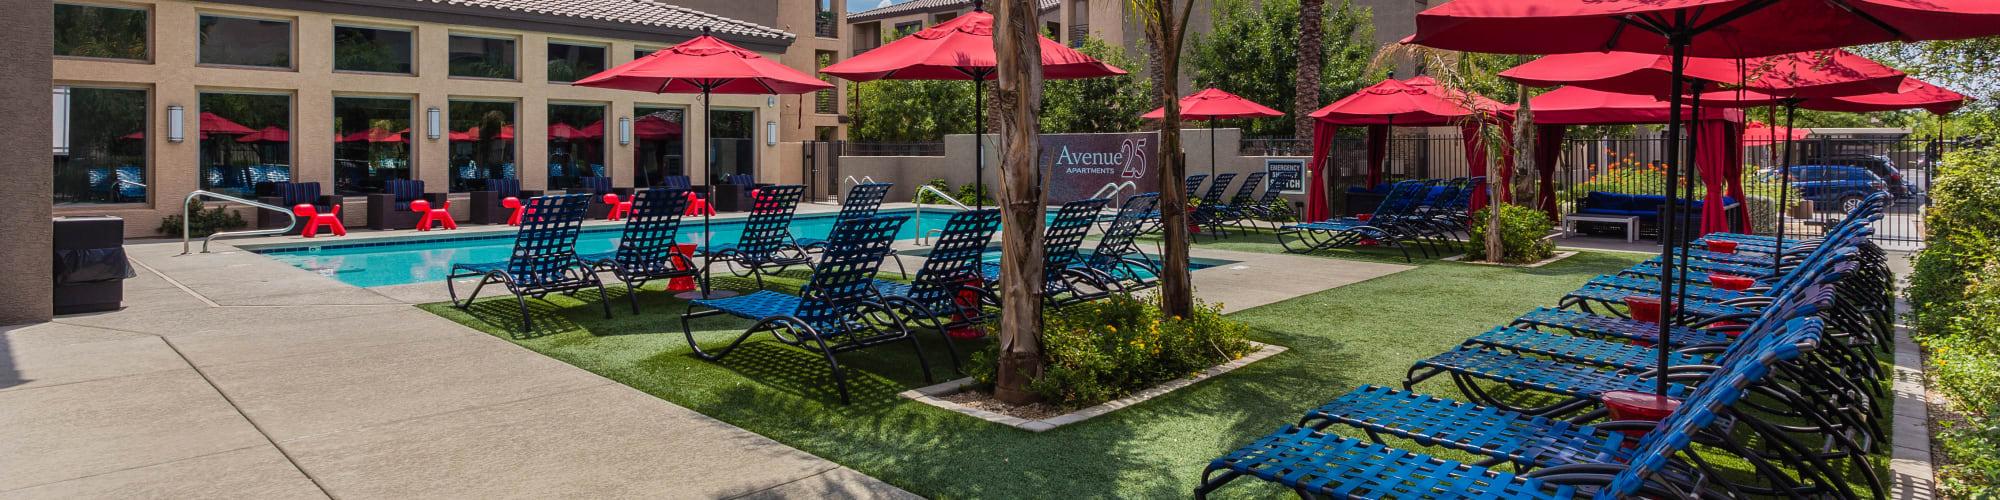 Photos of Avenue 25 Apartments in Phoenix, Arizona